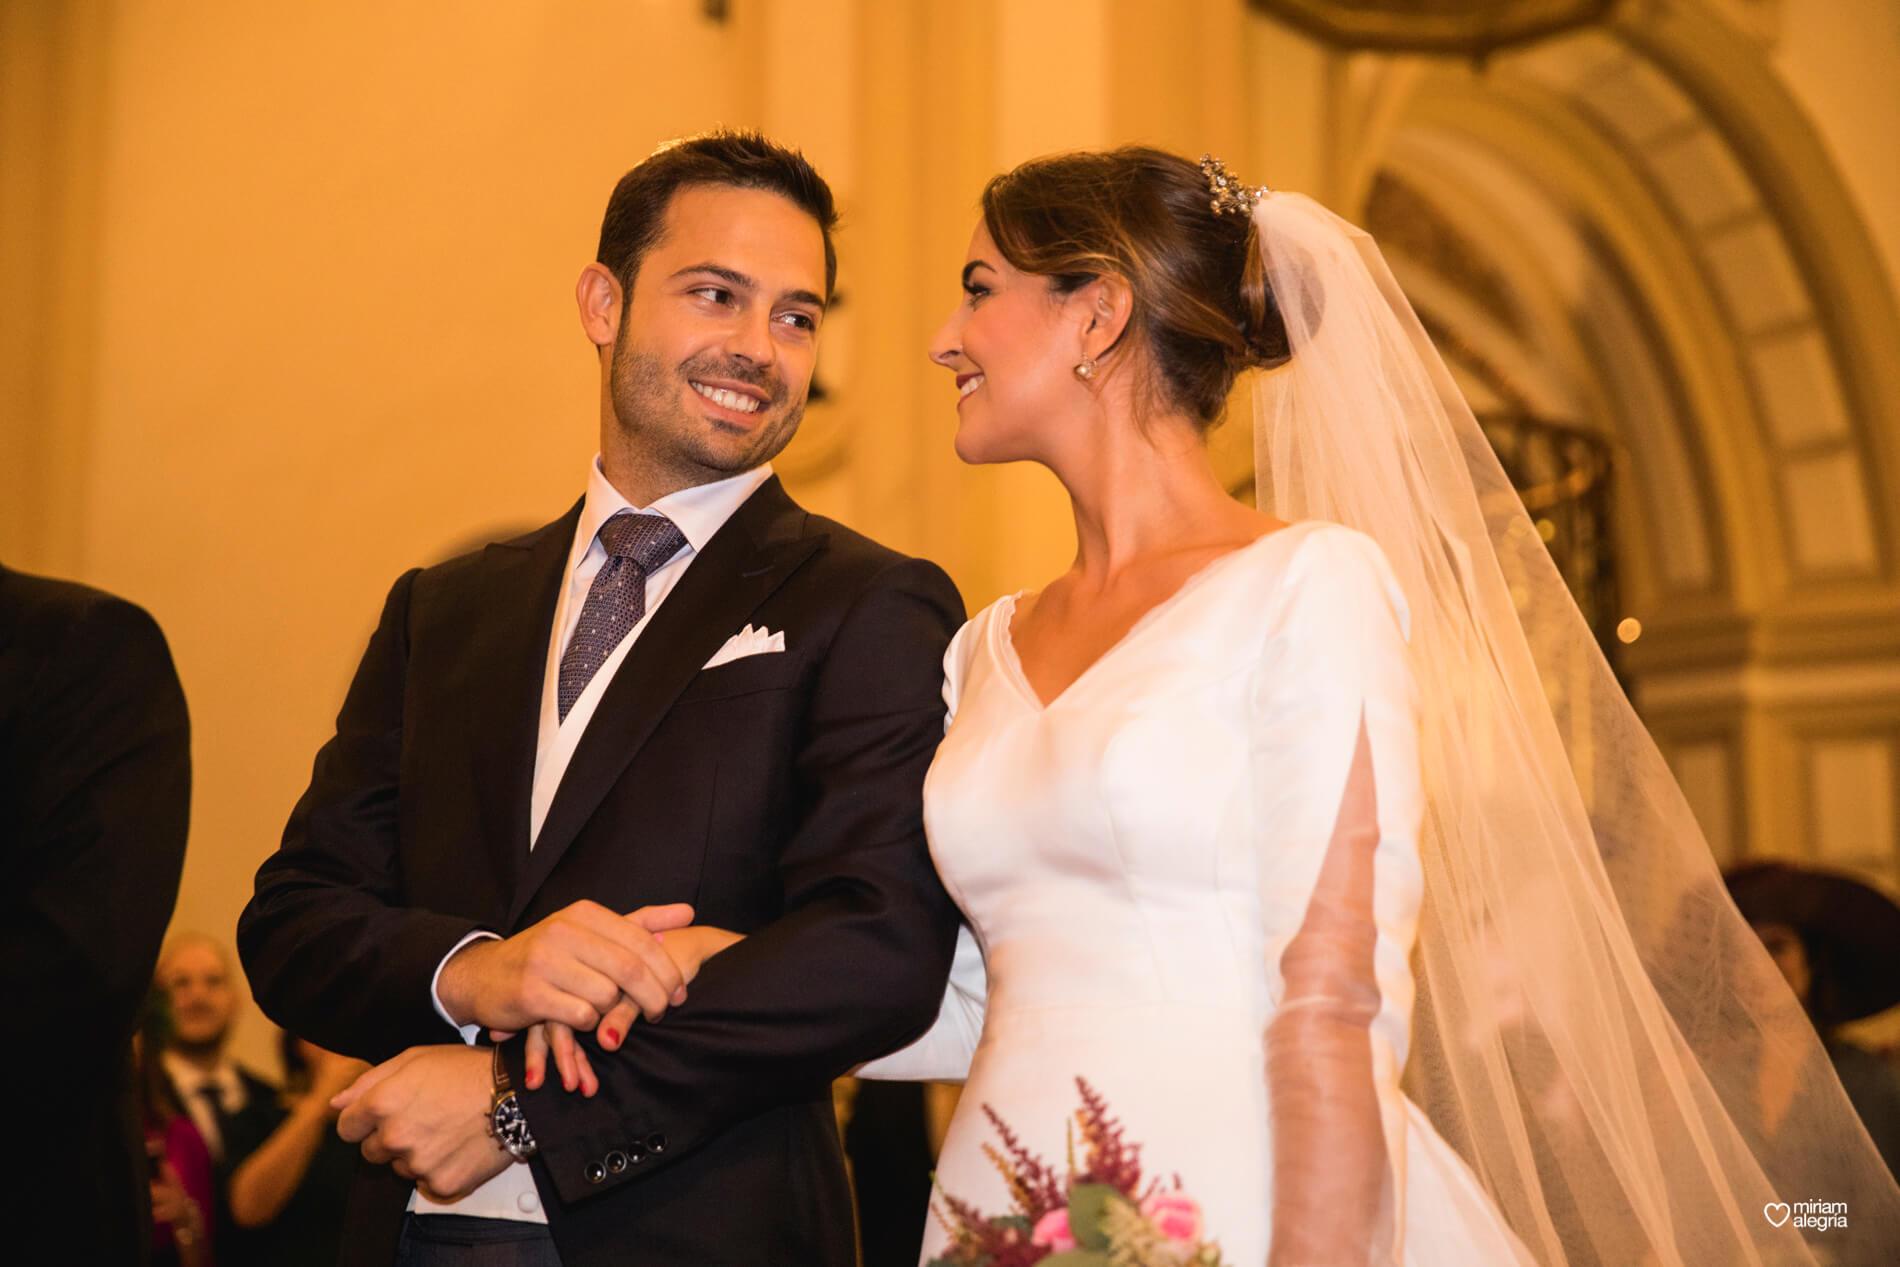 vestido-de-novia-paula-del-vas-miriam-alegria-fotografos-boda-murcia-50